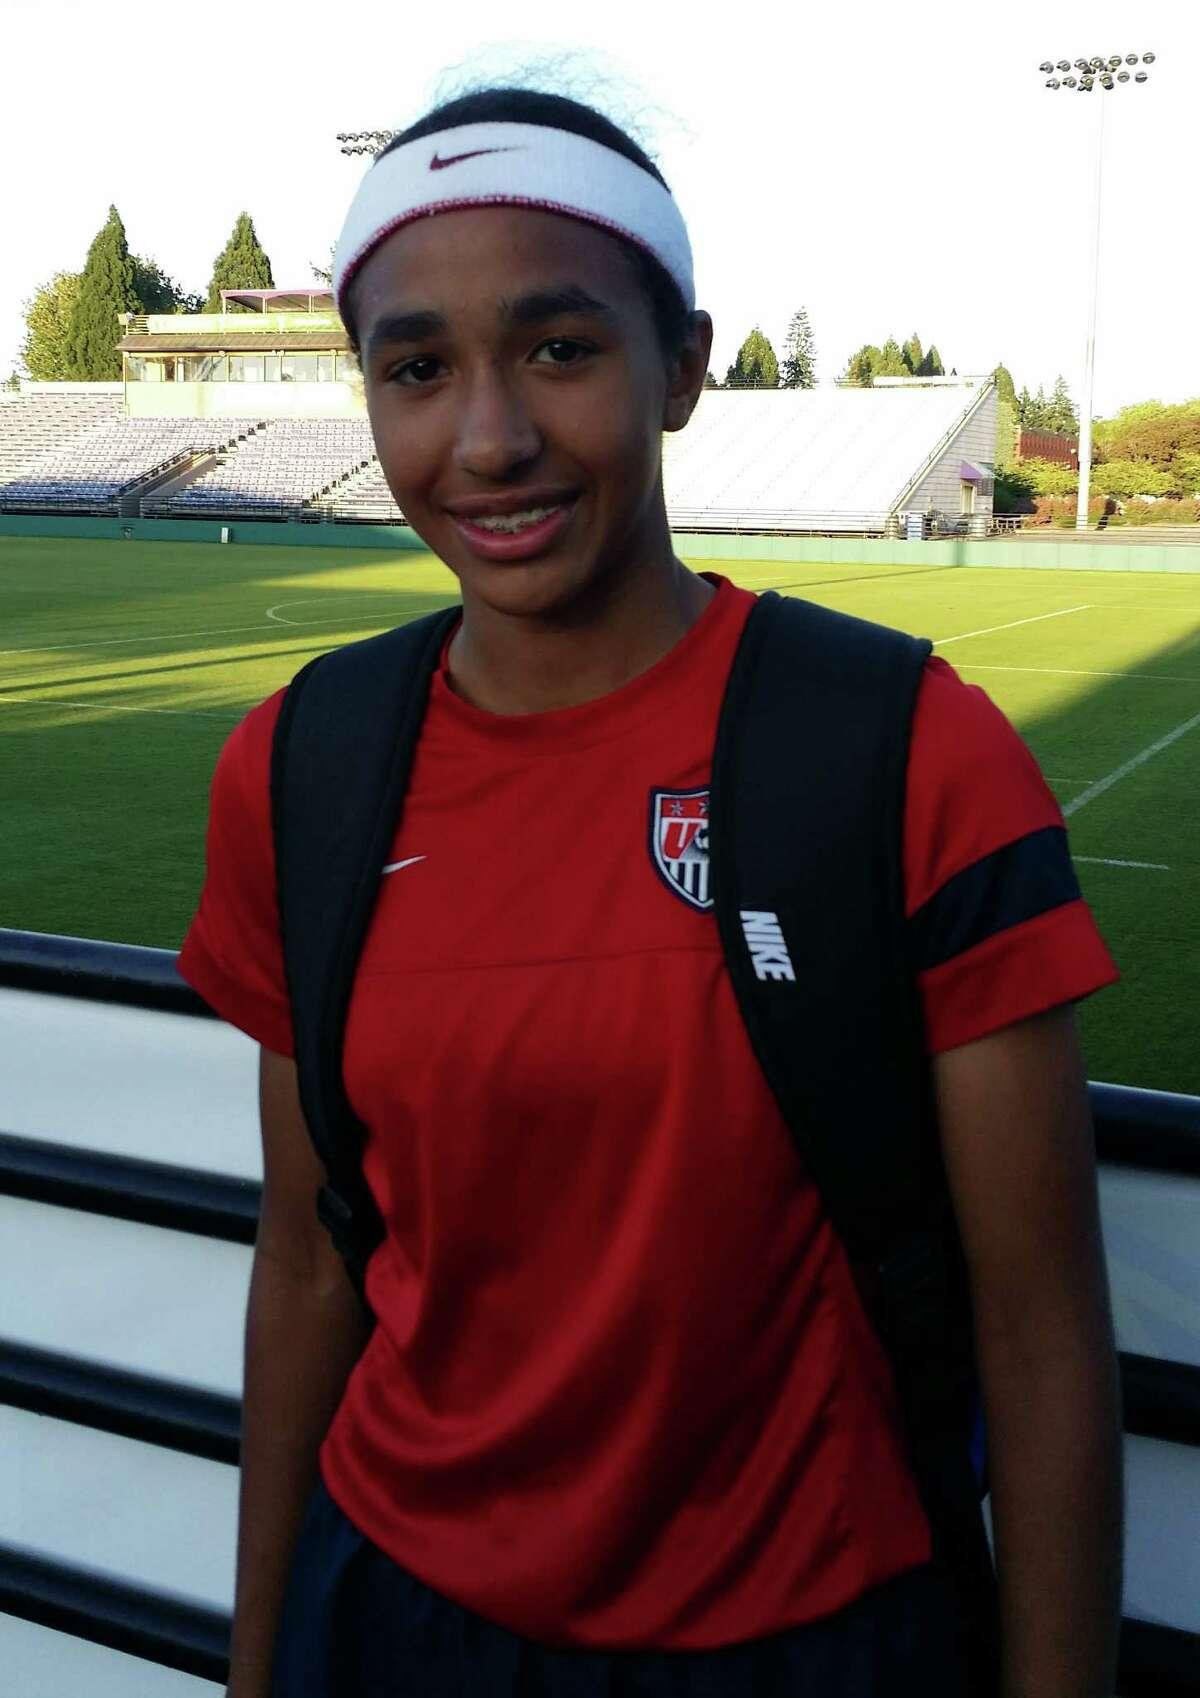 Jennifer Bartlett of Guilderland High School played for Under-15 Girls National Team